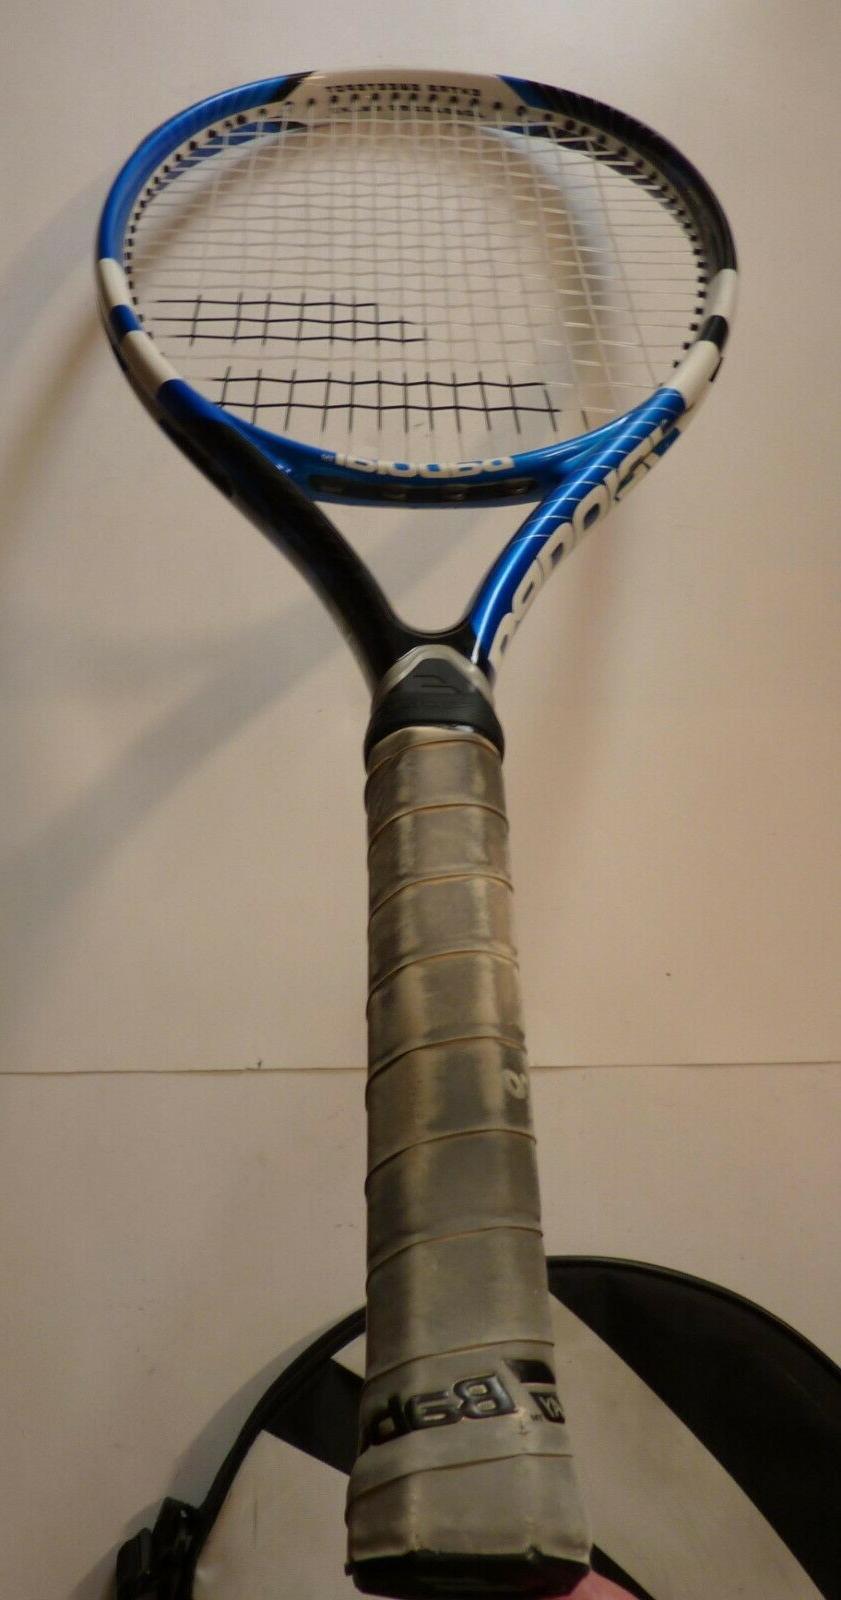 drive max 110 tennis racquet 4 extra